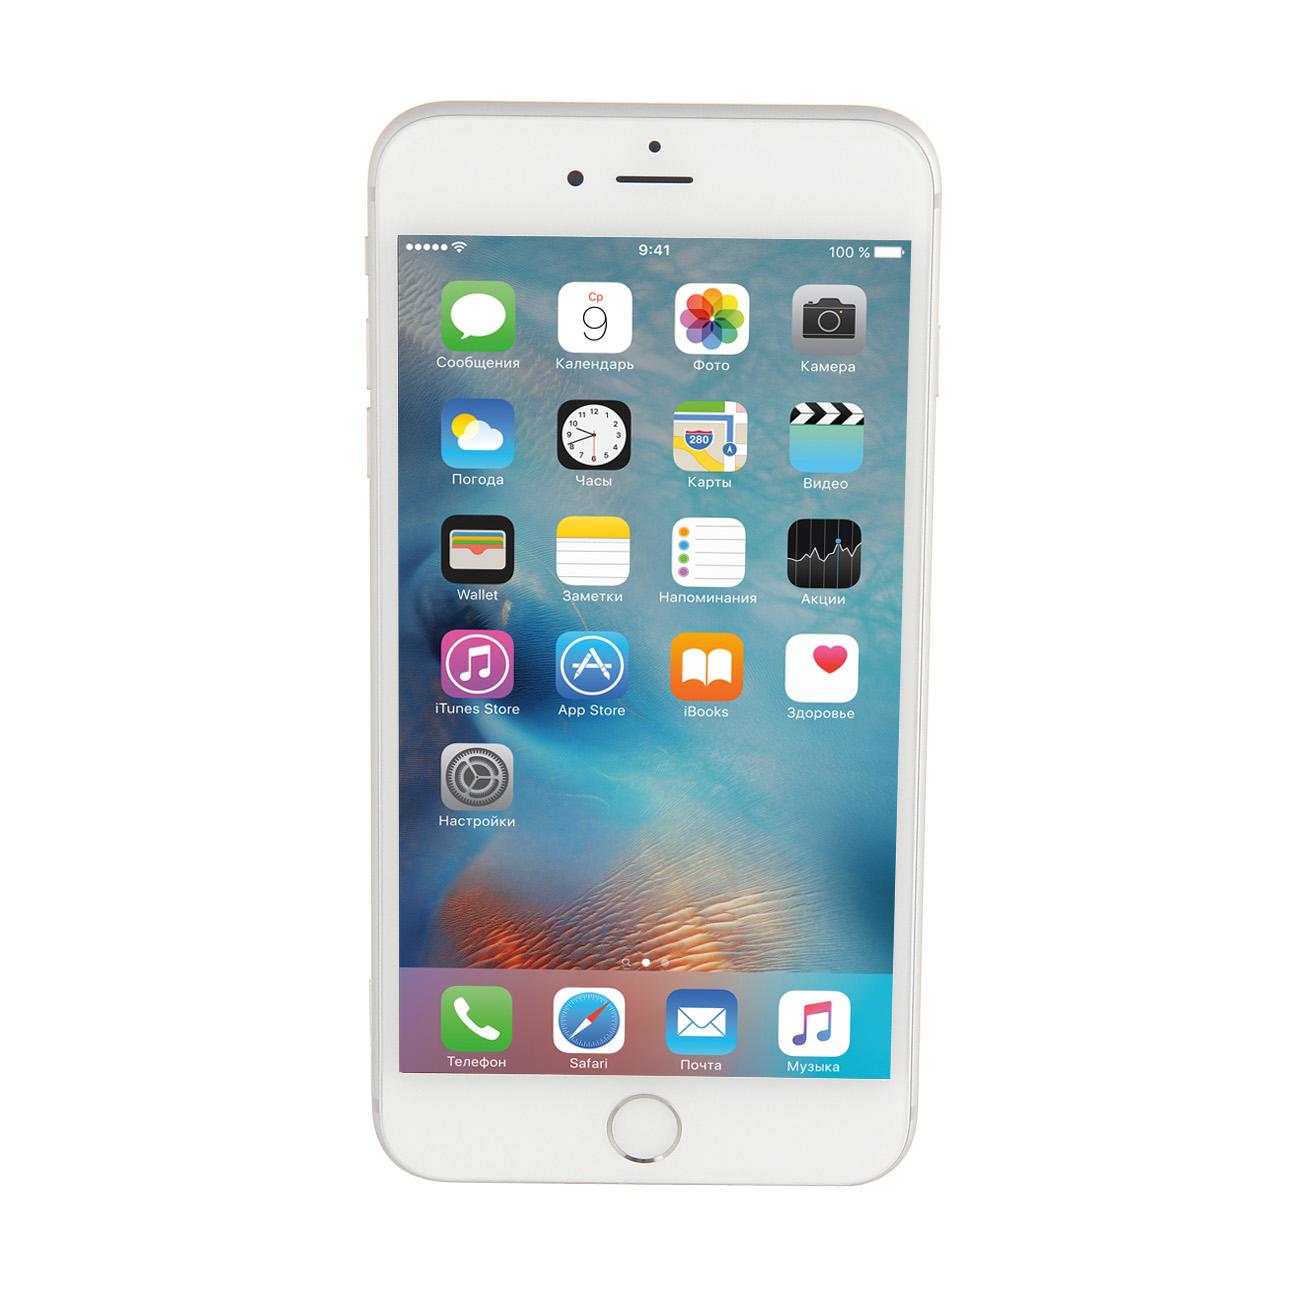 Купить Смартфон Apple iPhone 6 Plus 128GB Silver (MGAE2RU/A) недорого